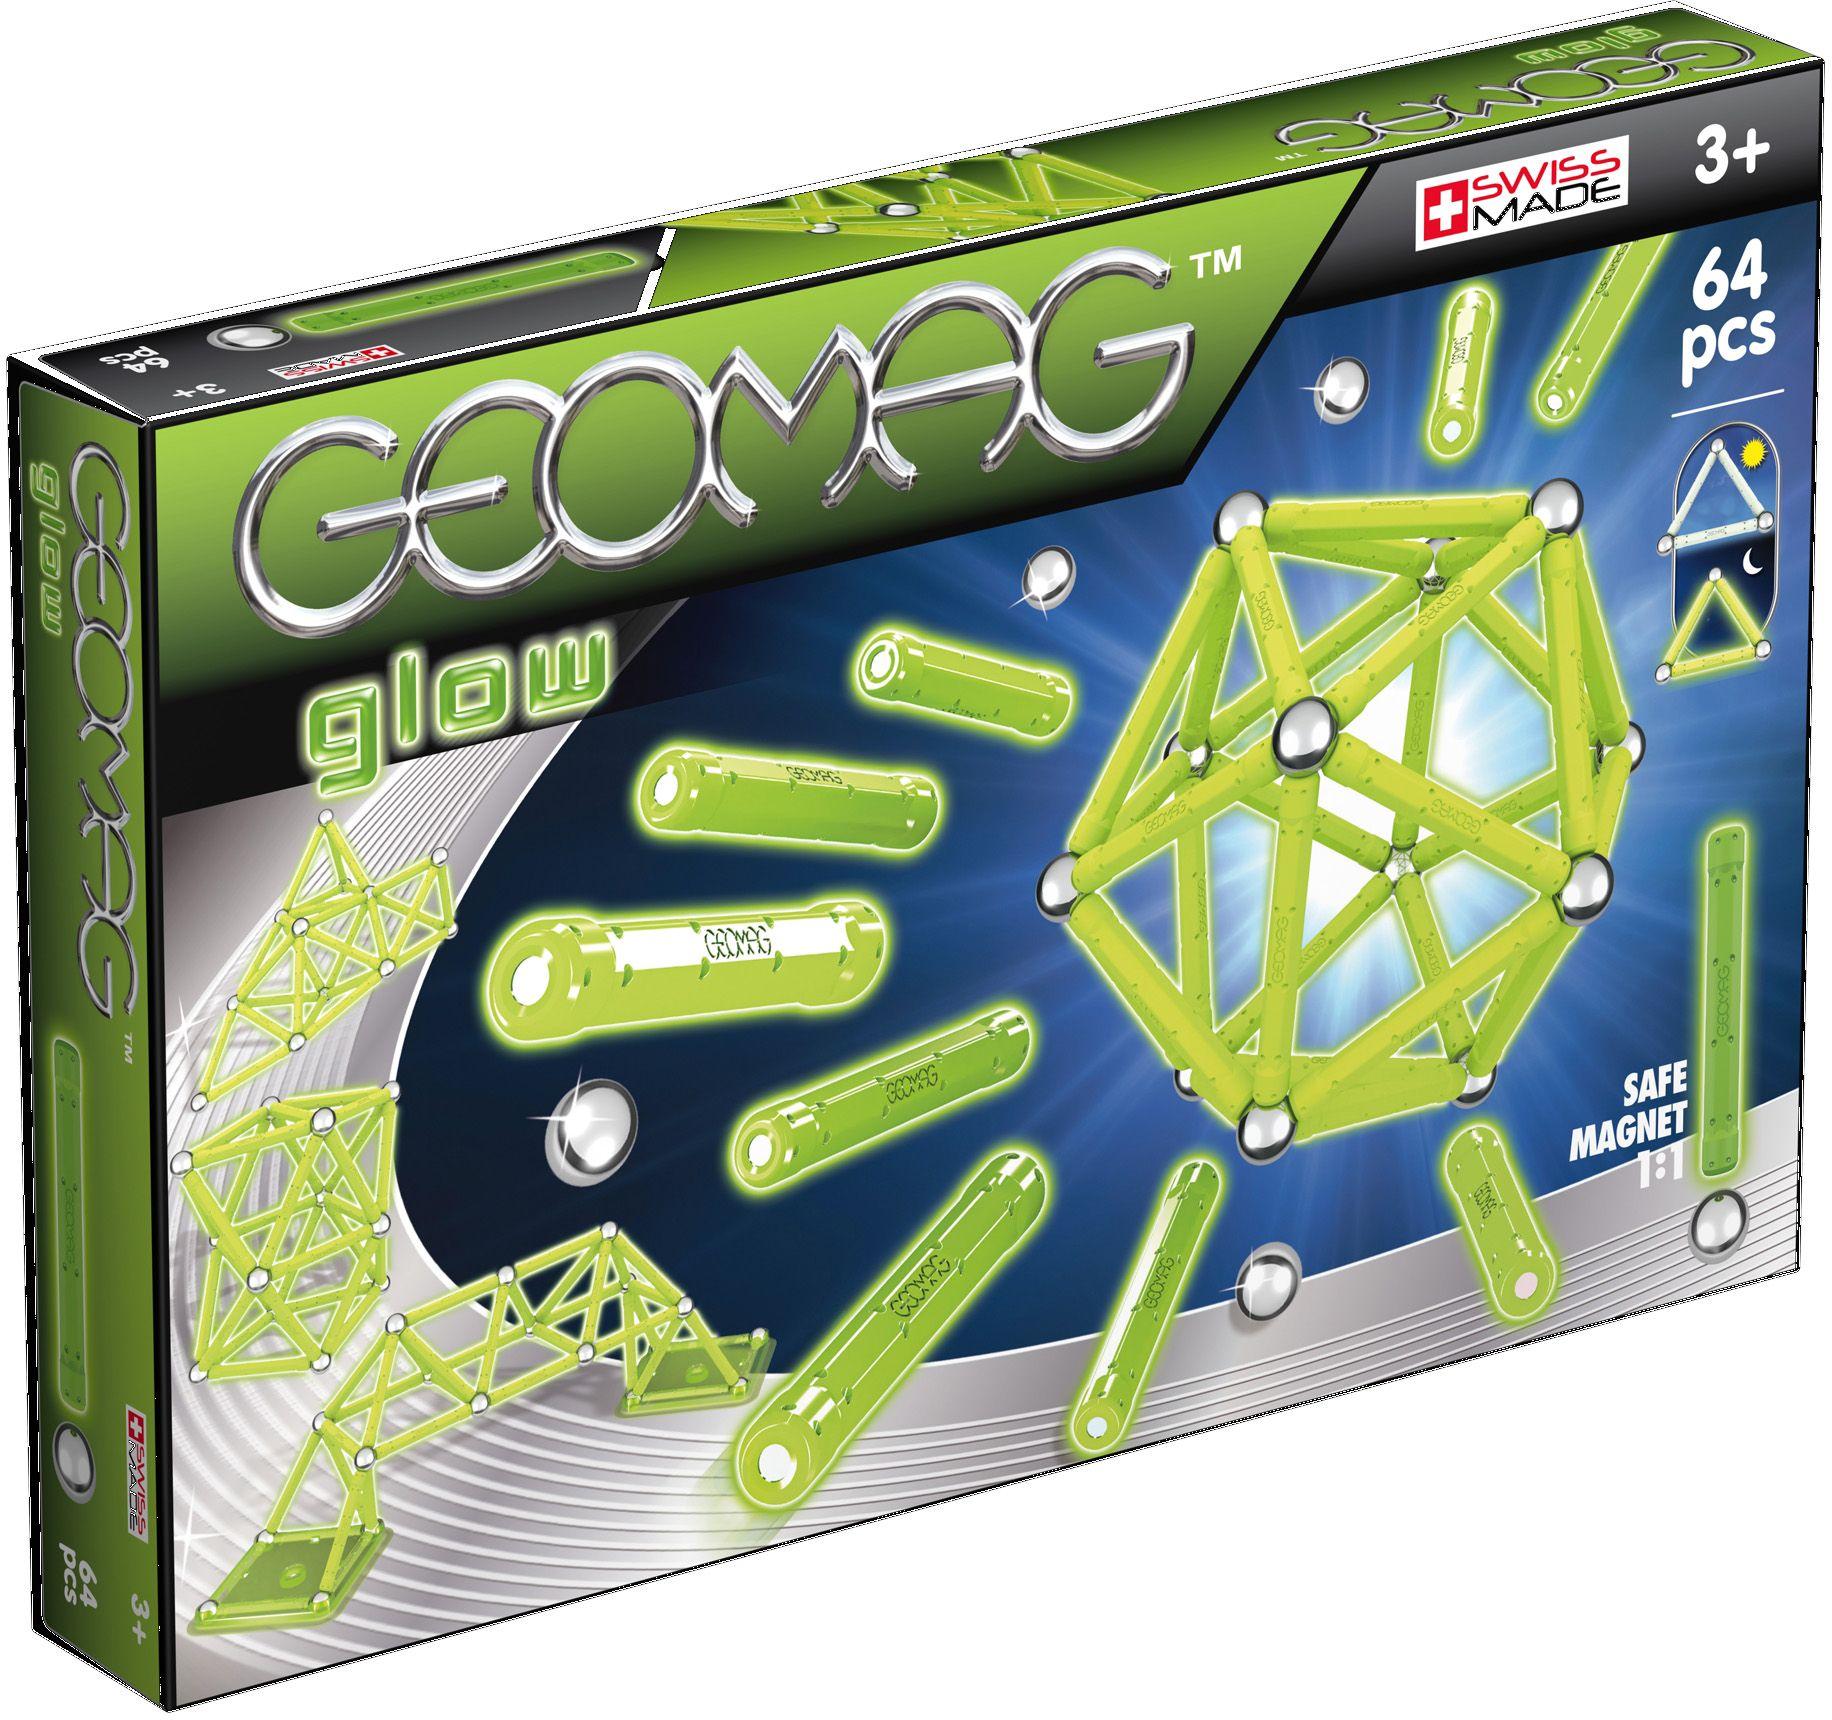 GEOMAG Geomag? Konstruktionsspielzeug (64-tlg.), »Glow«